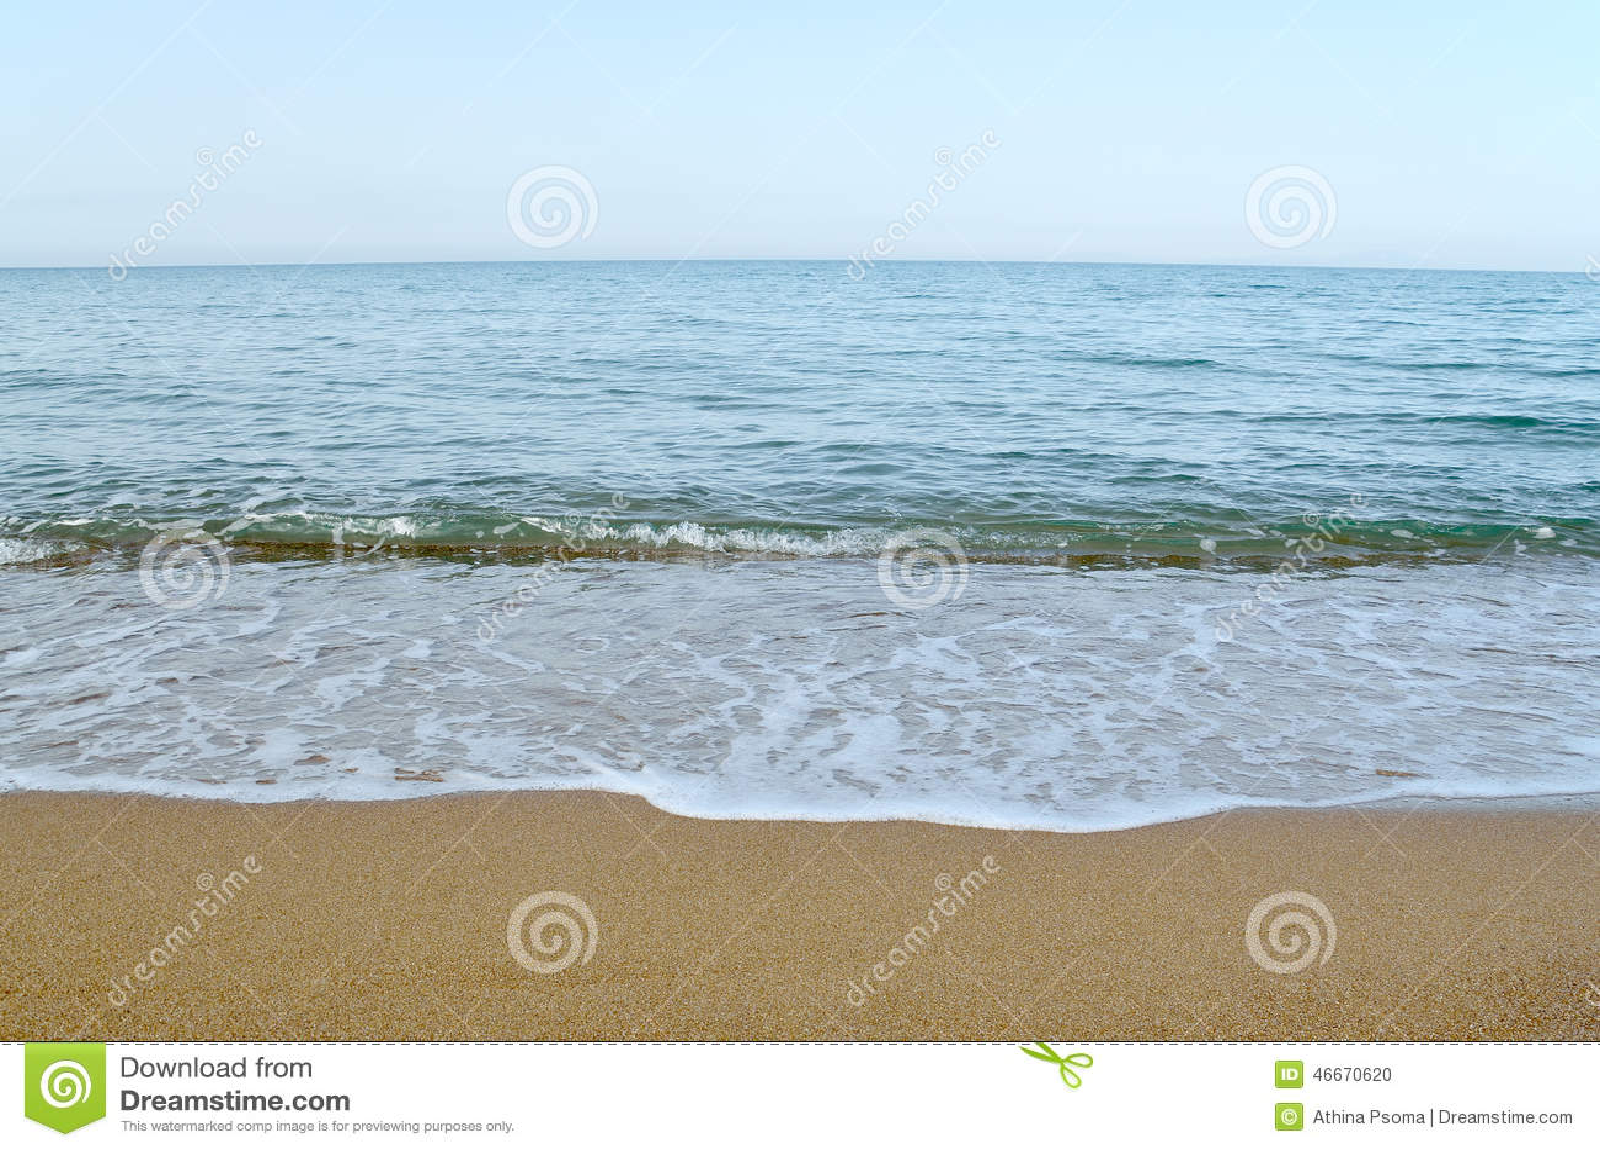 Ciel, mer et sable